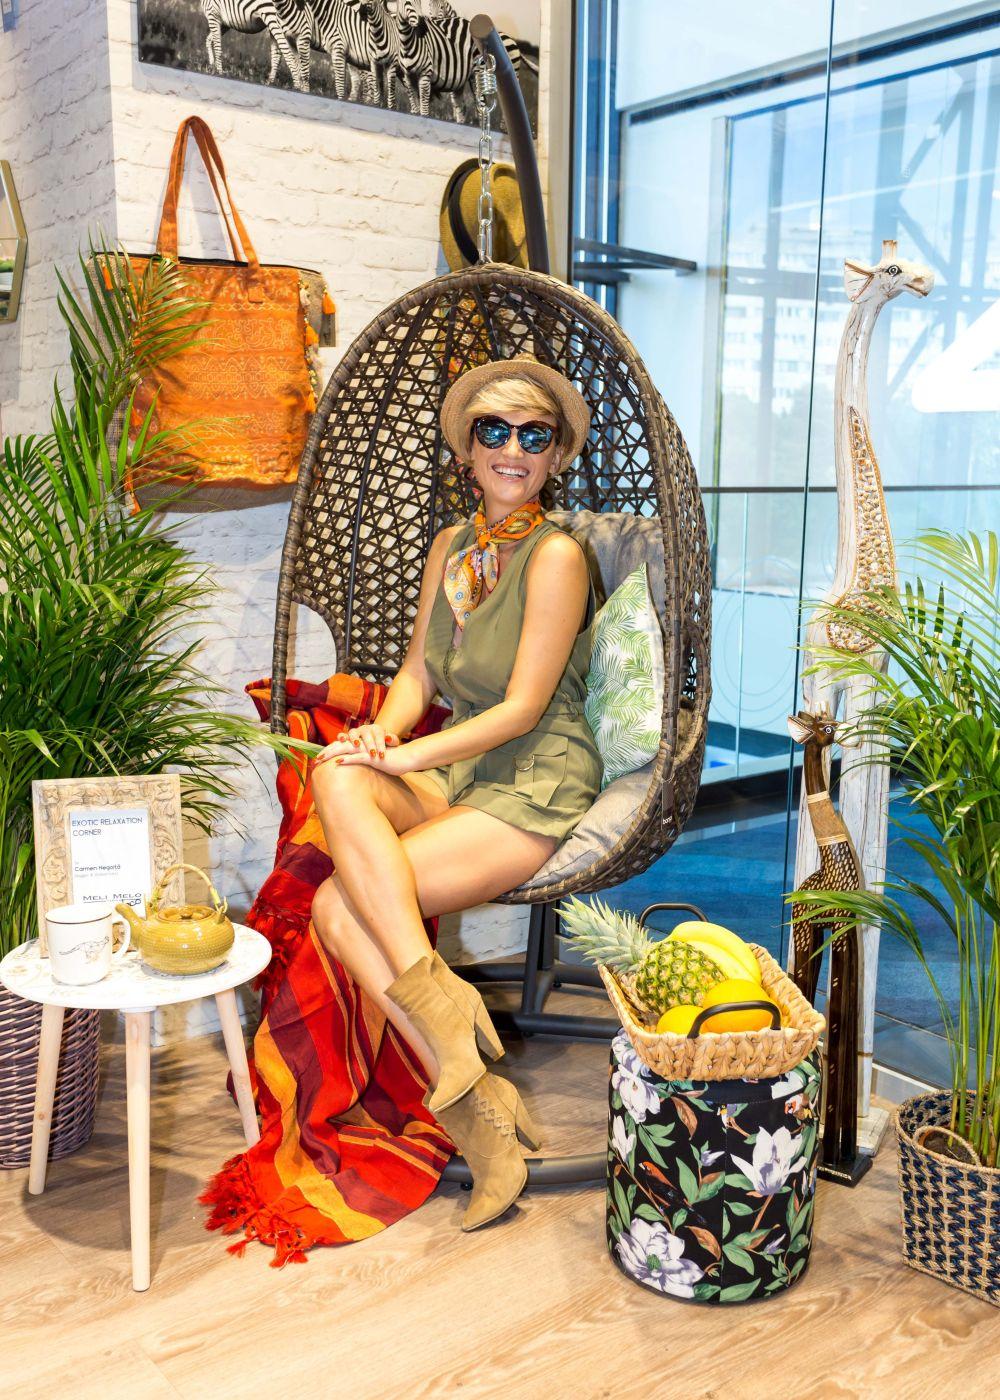 adelaparvu.com despre magazinul de decoratiuni Meli Melo Deco, decor corner carmen negoita